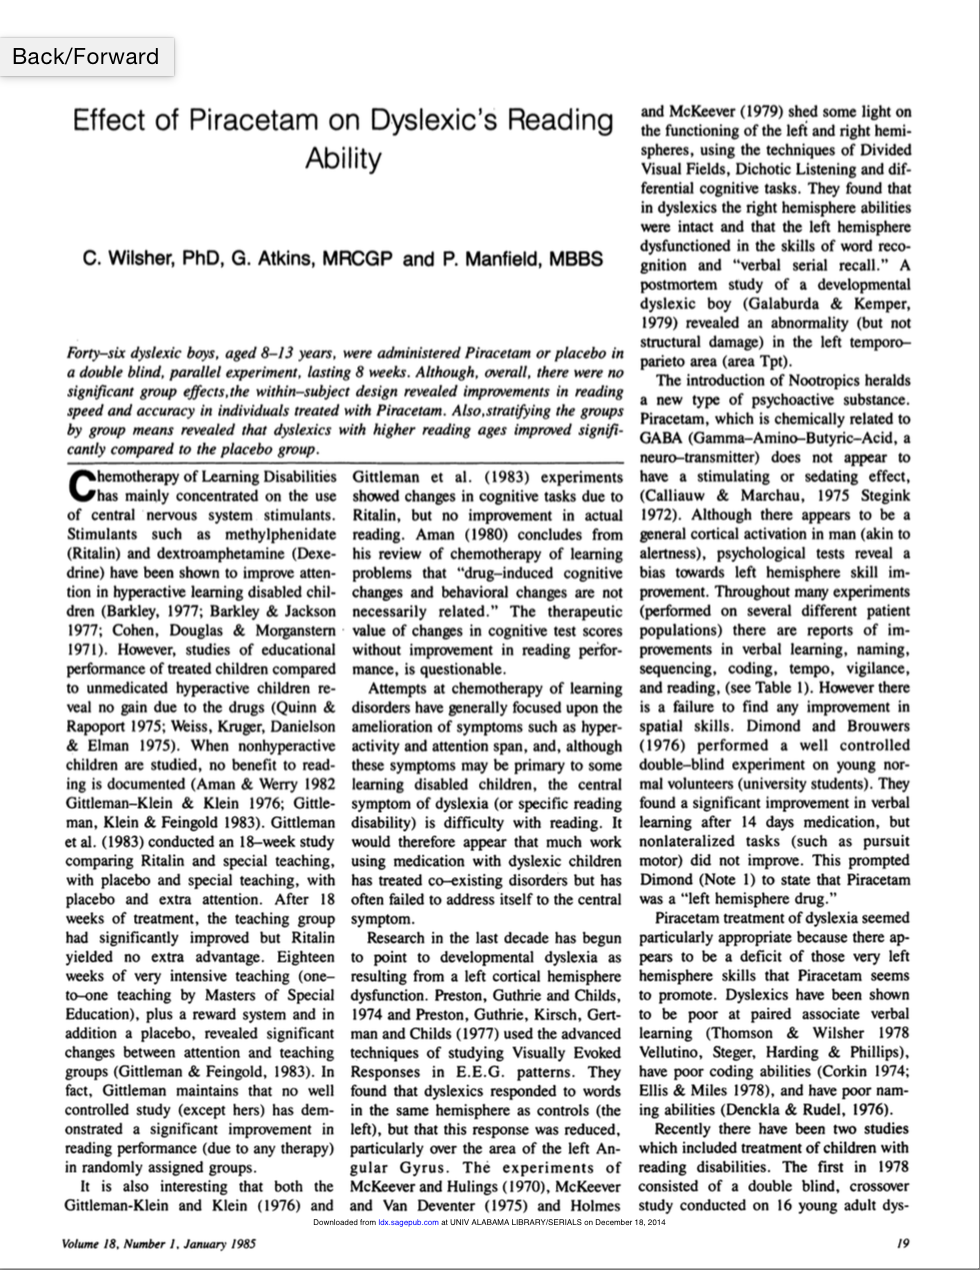 Effect of Piracetam on Dyslexic's Reading Ability